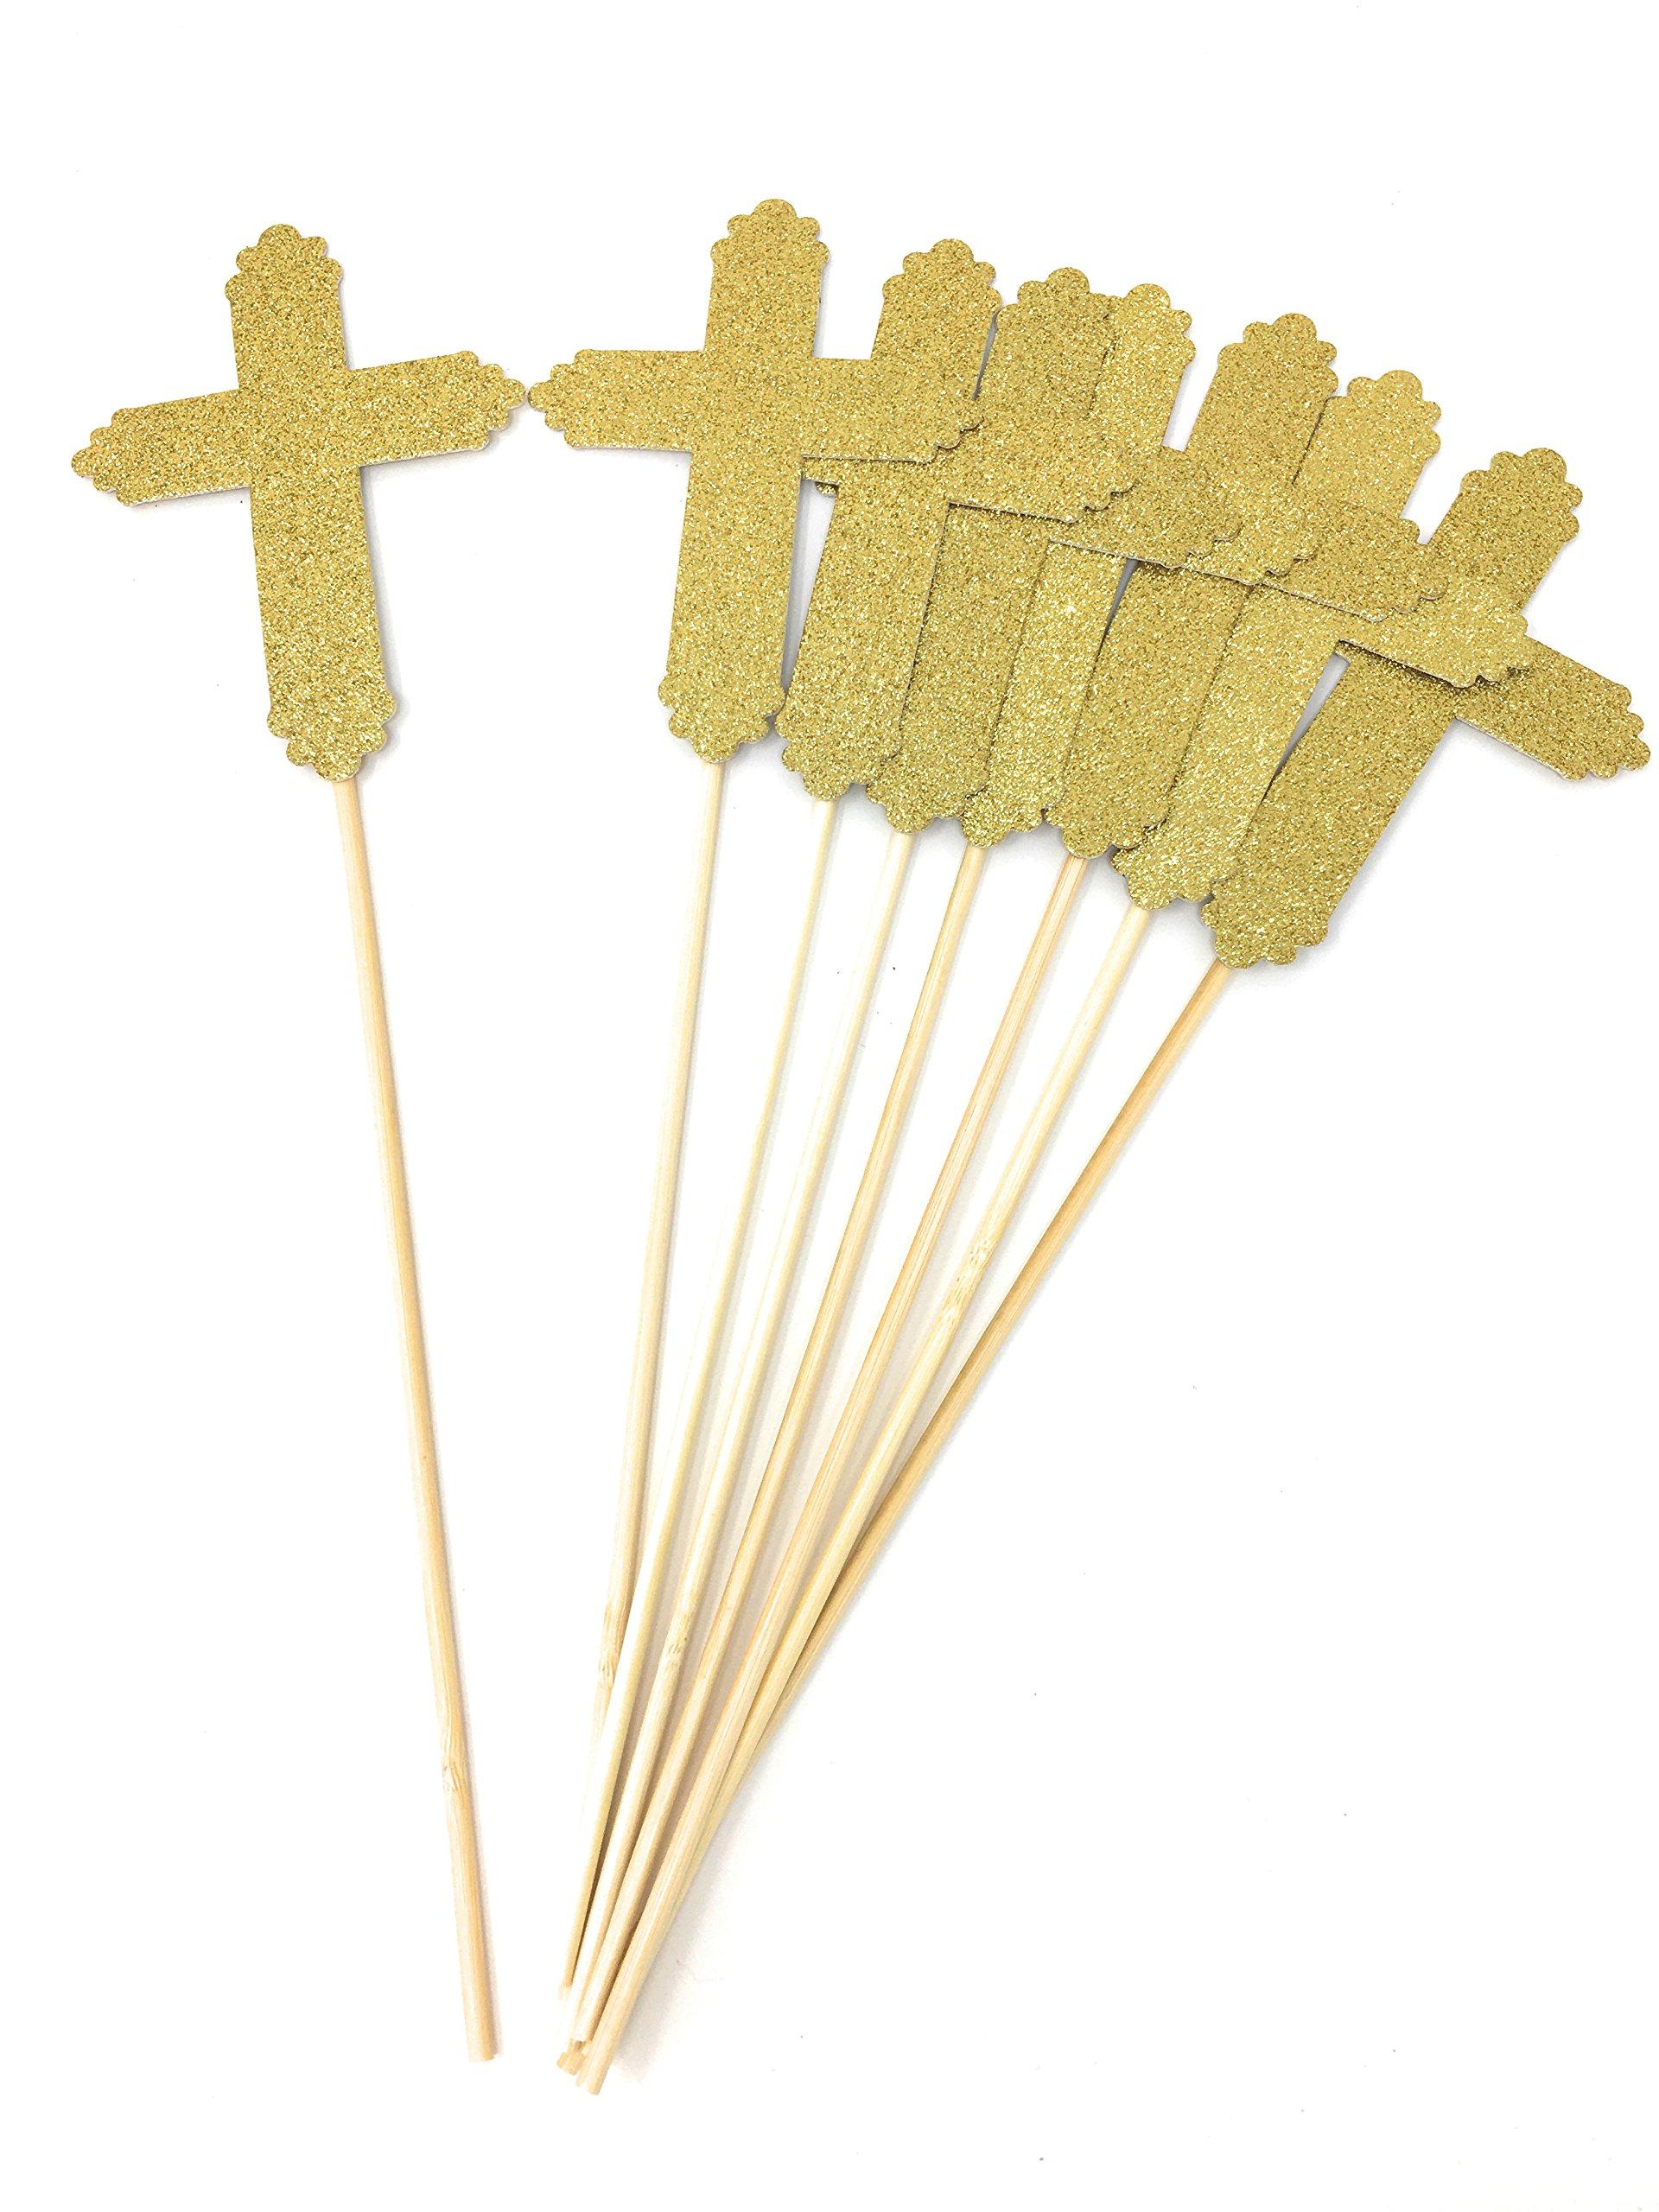 8 Pack Gold Glitter Cross Centerpiece Sticks for Baptism Funeral First Communion Floral Picks (Gold, 8)